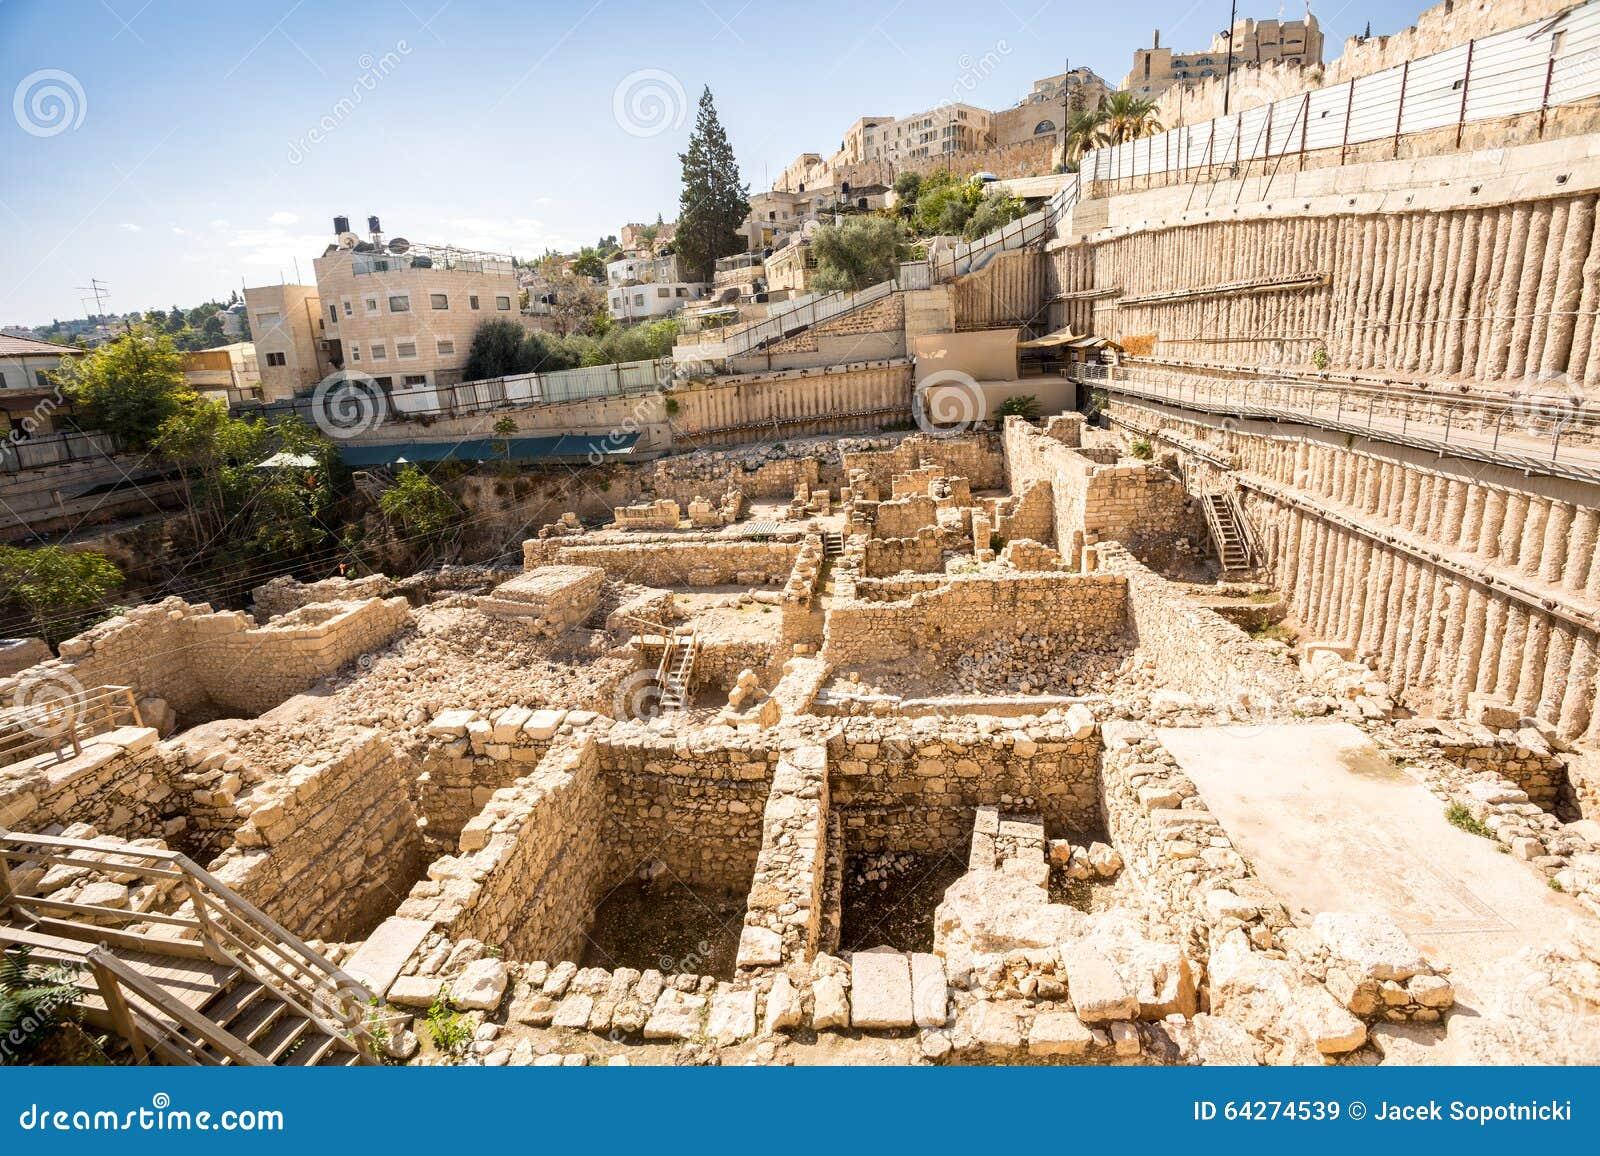 Download Archeological Site In Jerusalem, Israel Stock Image - Image of ruin, palestine: 64274539